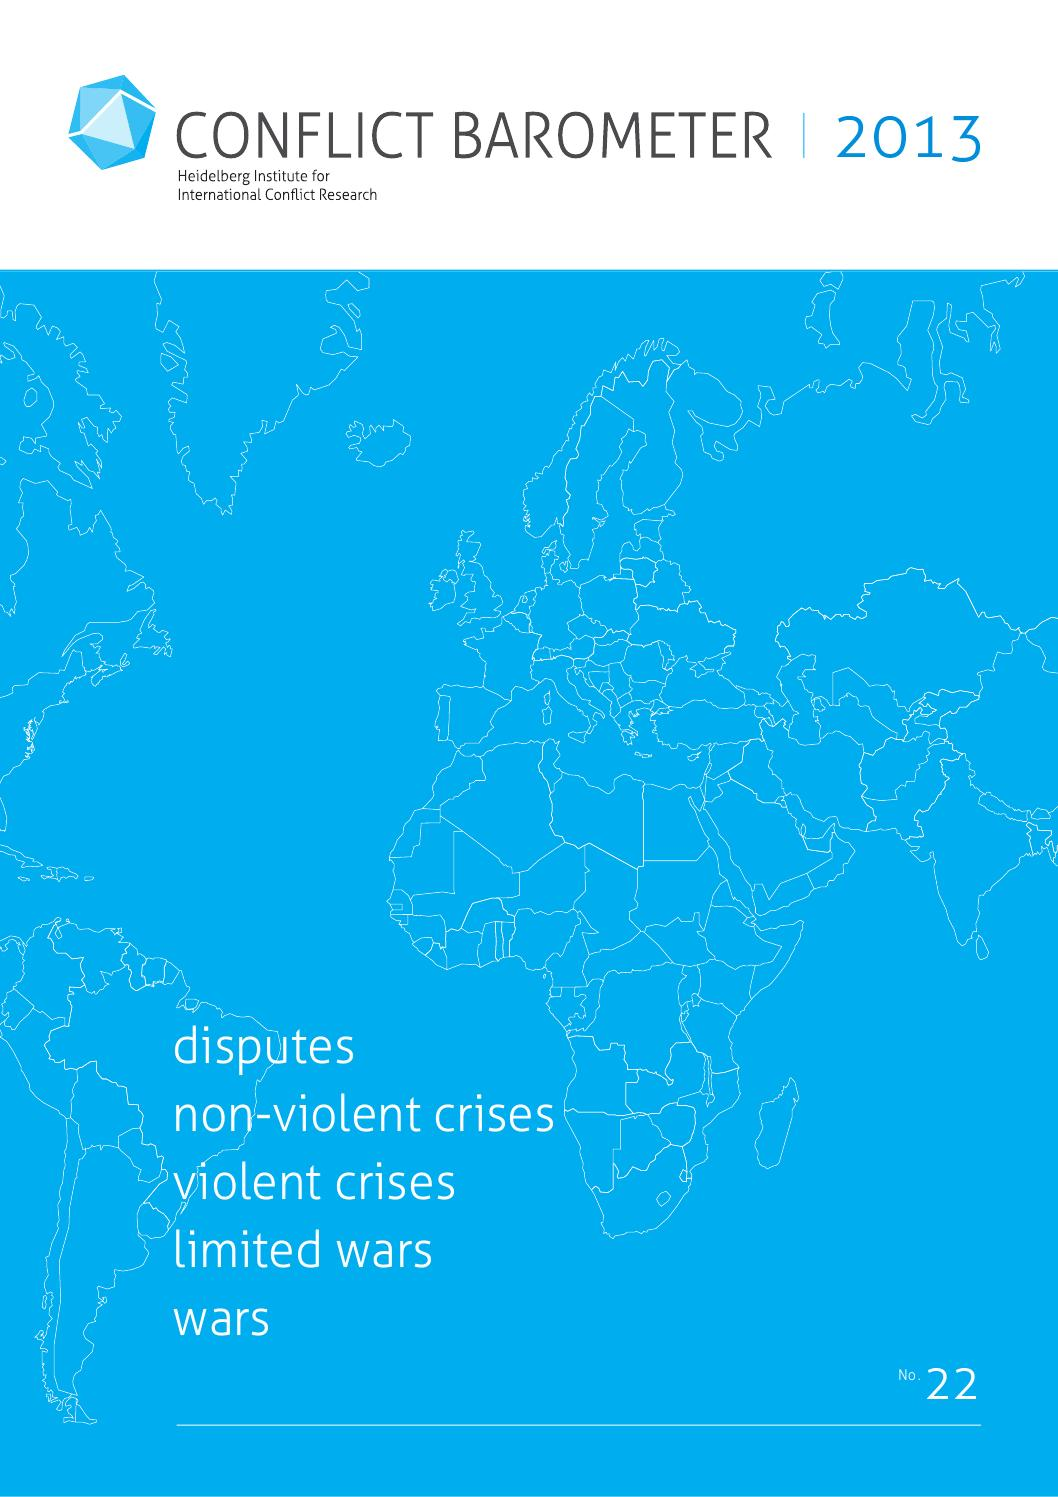 Conflict Barometer 2013 by Jorge F Acevedo - issuu